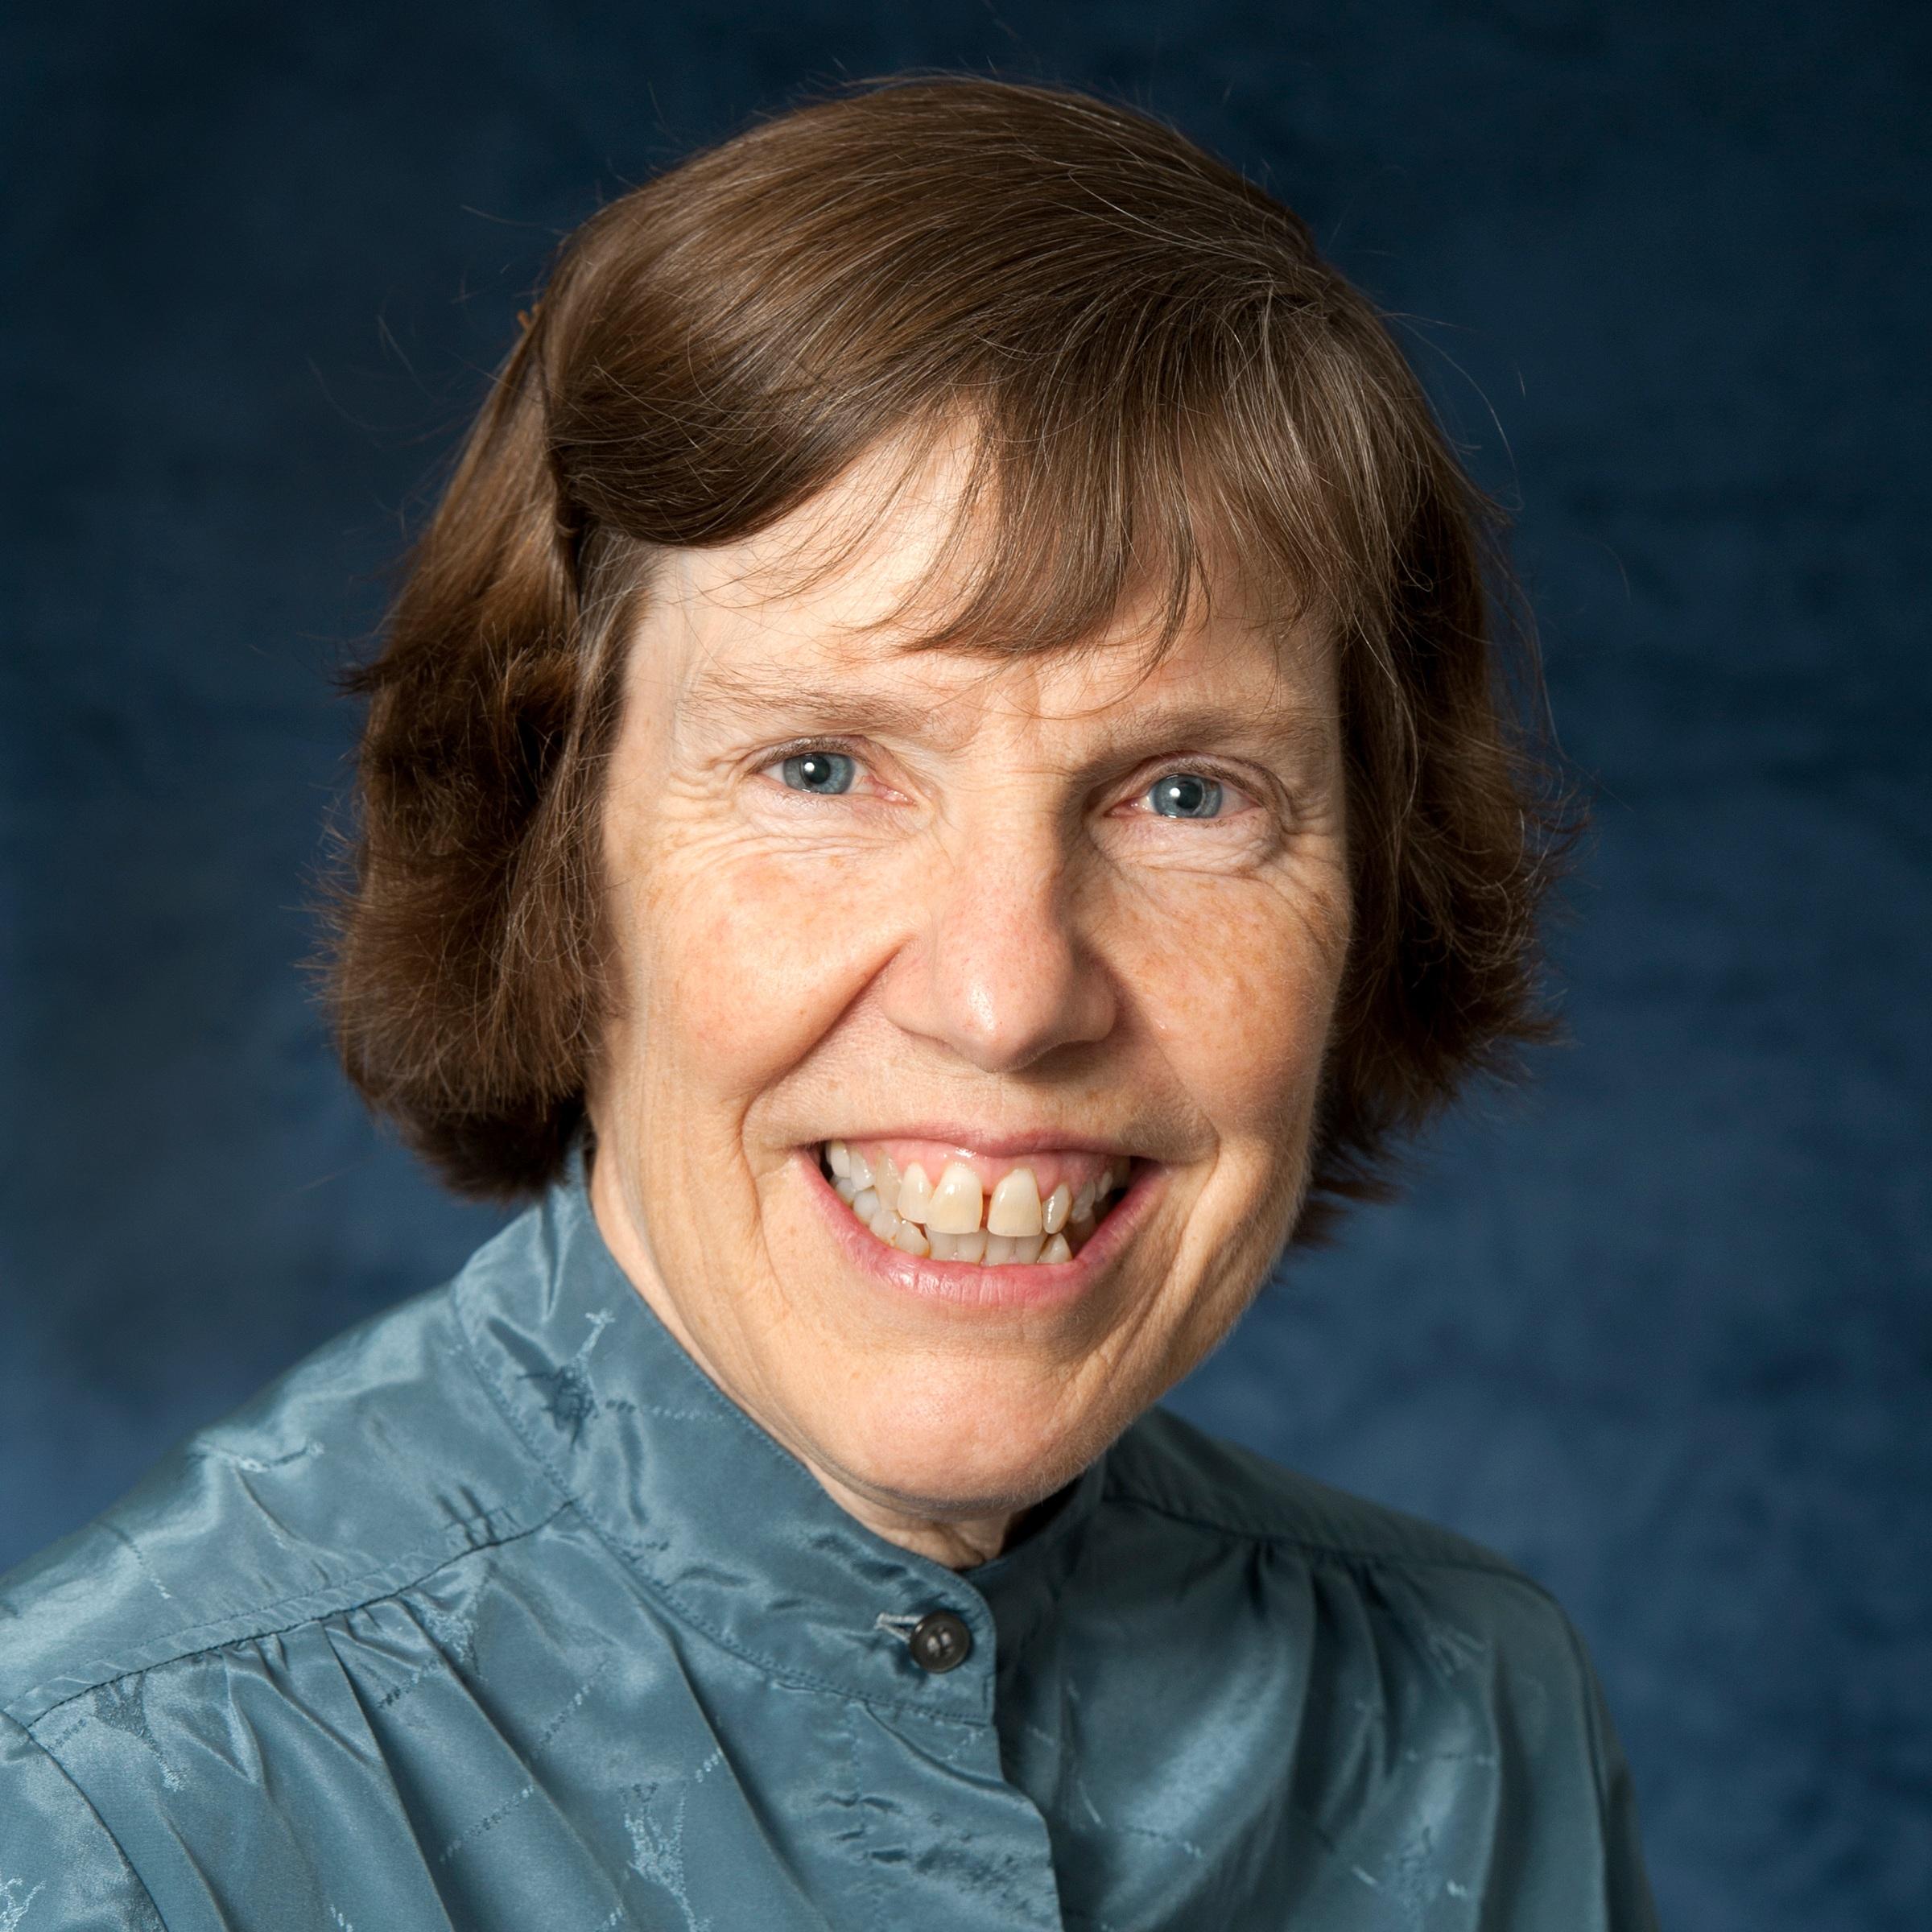 Mary Smith, DVM - Professor, Population Medicine & Diagnostic Services, Cornell University College of Veterinary Medicine